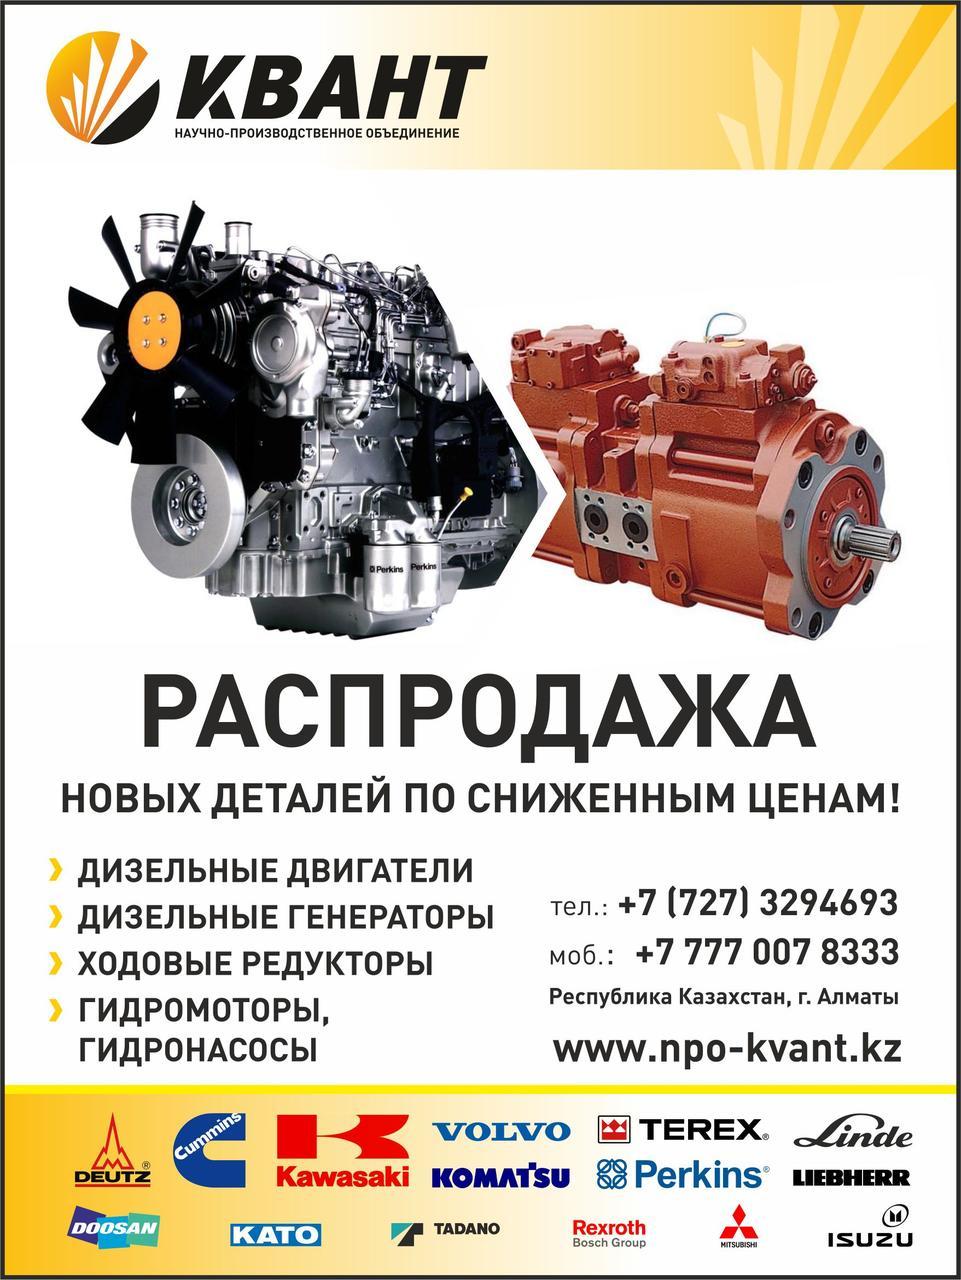 Двигатель MTU PDU375C, MTU 6R 1100 C30, MTU PDU400C, MTU PDU425C, MTU 6R 1300 C20, MTU 502 C, MTU PDU450C